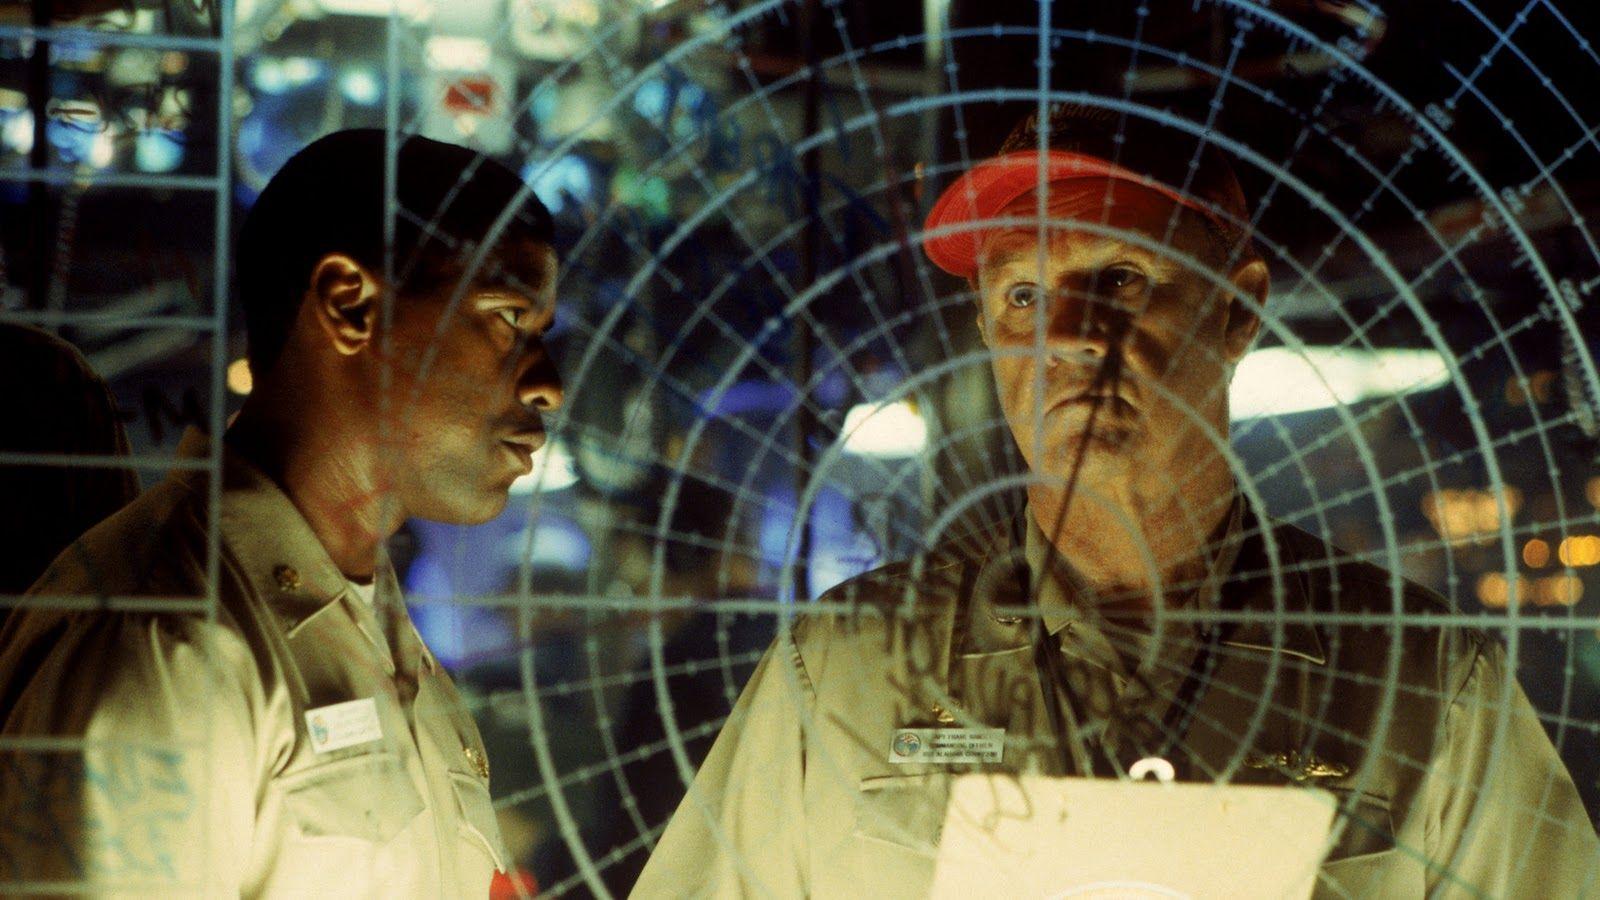 Crimson Tide; Starring: Denzel Washington, Gene Hackman, Viggo Mortensen, James Gandolfini, and Matt Craven.